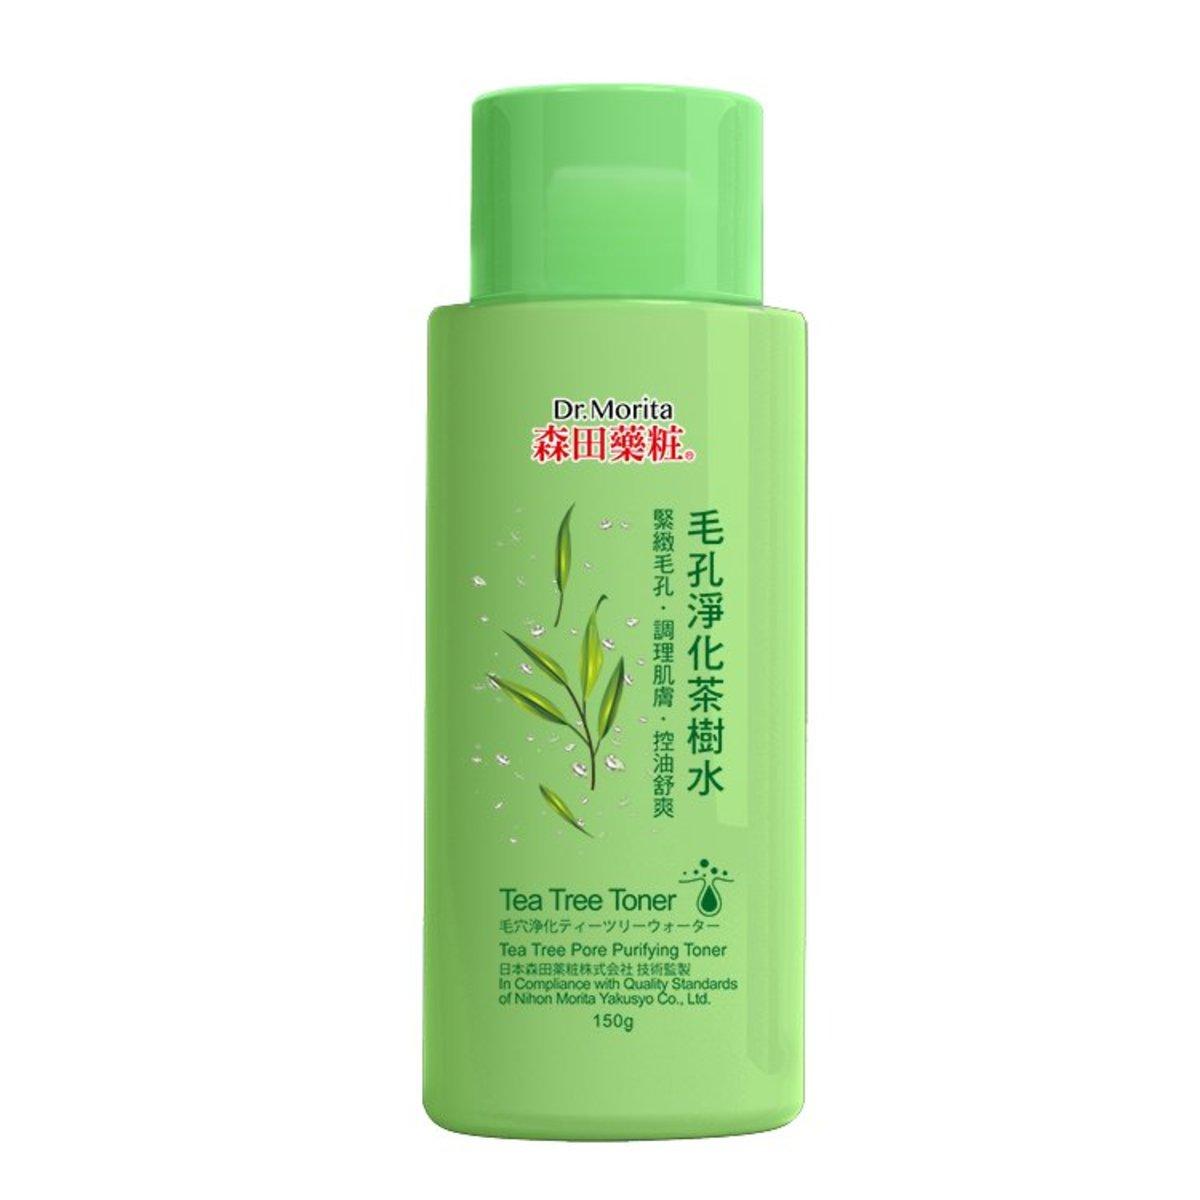 Dr. Morita   Tea Tree Purifying Toner 150g   HKTVmall Online Shopping